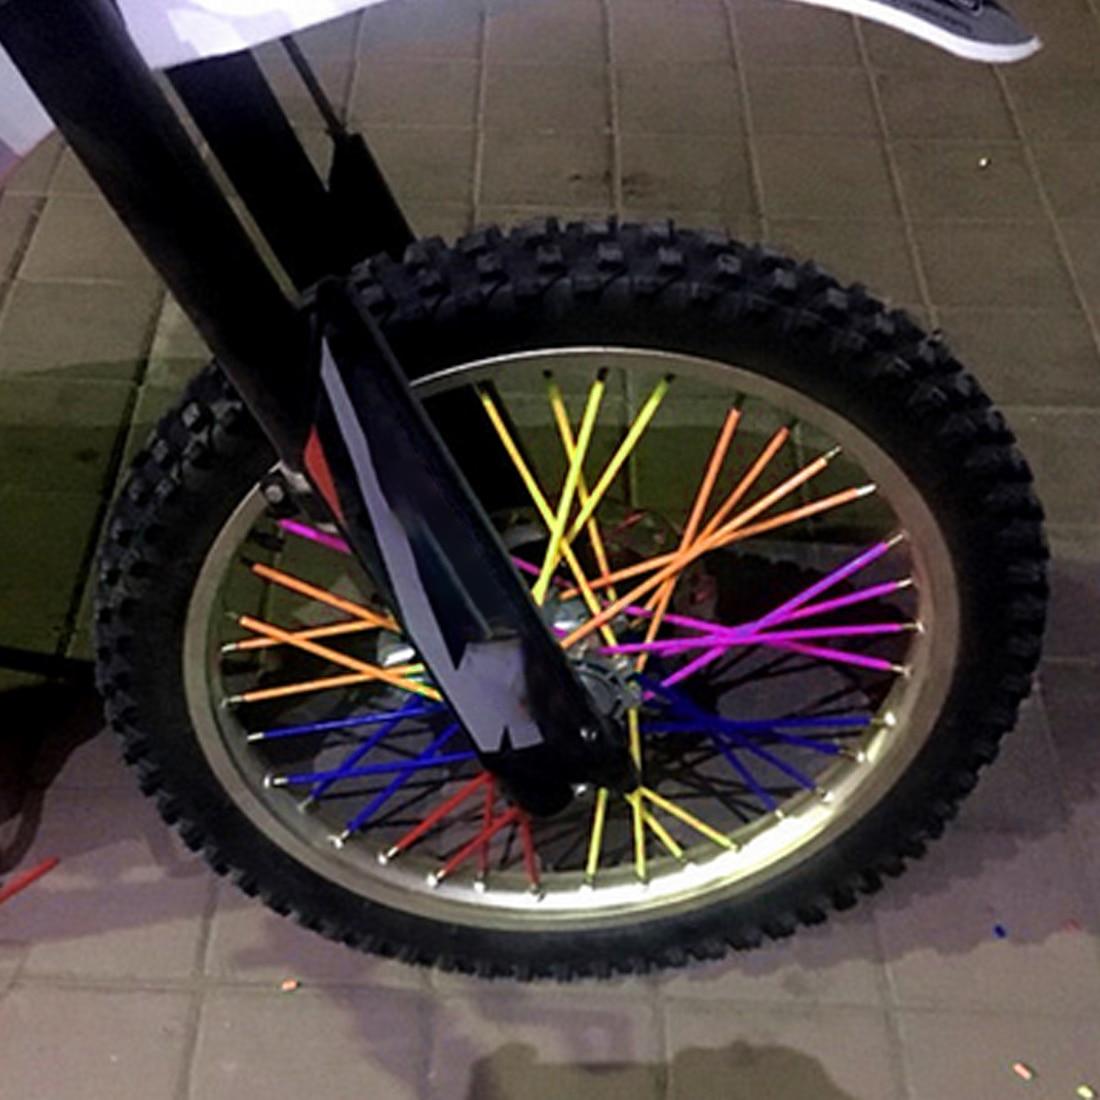 Honda Crf 125 Price: Aliexpress.com : Buy Motorcycle Dirt Bike Enduro Off Road